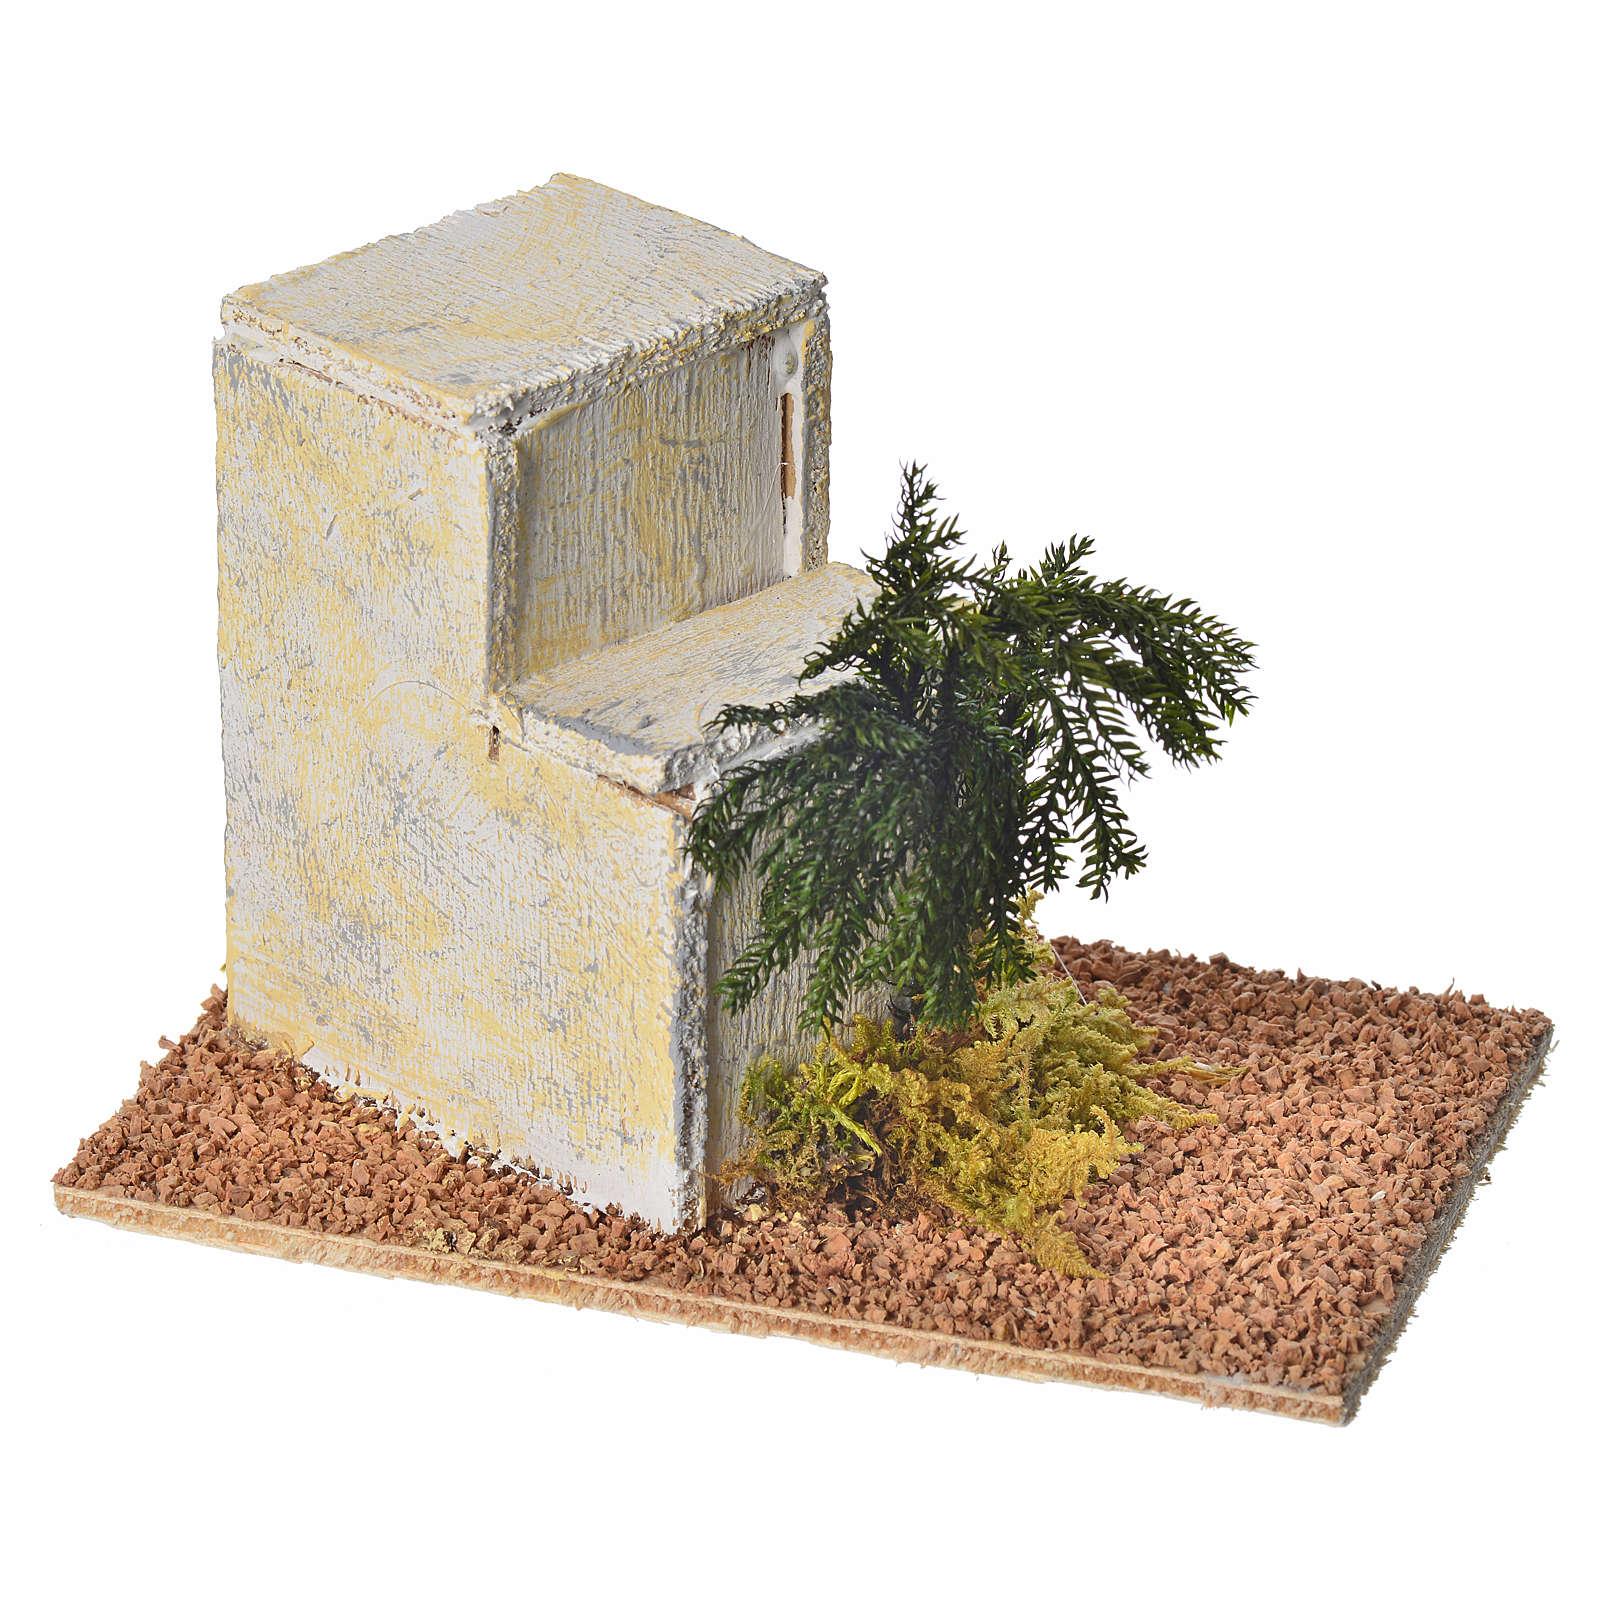 Casa araba in legno per presepe 8x14x9 cm 4